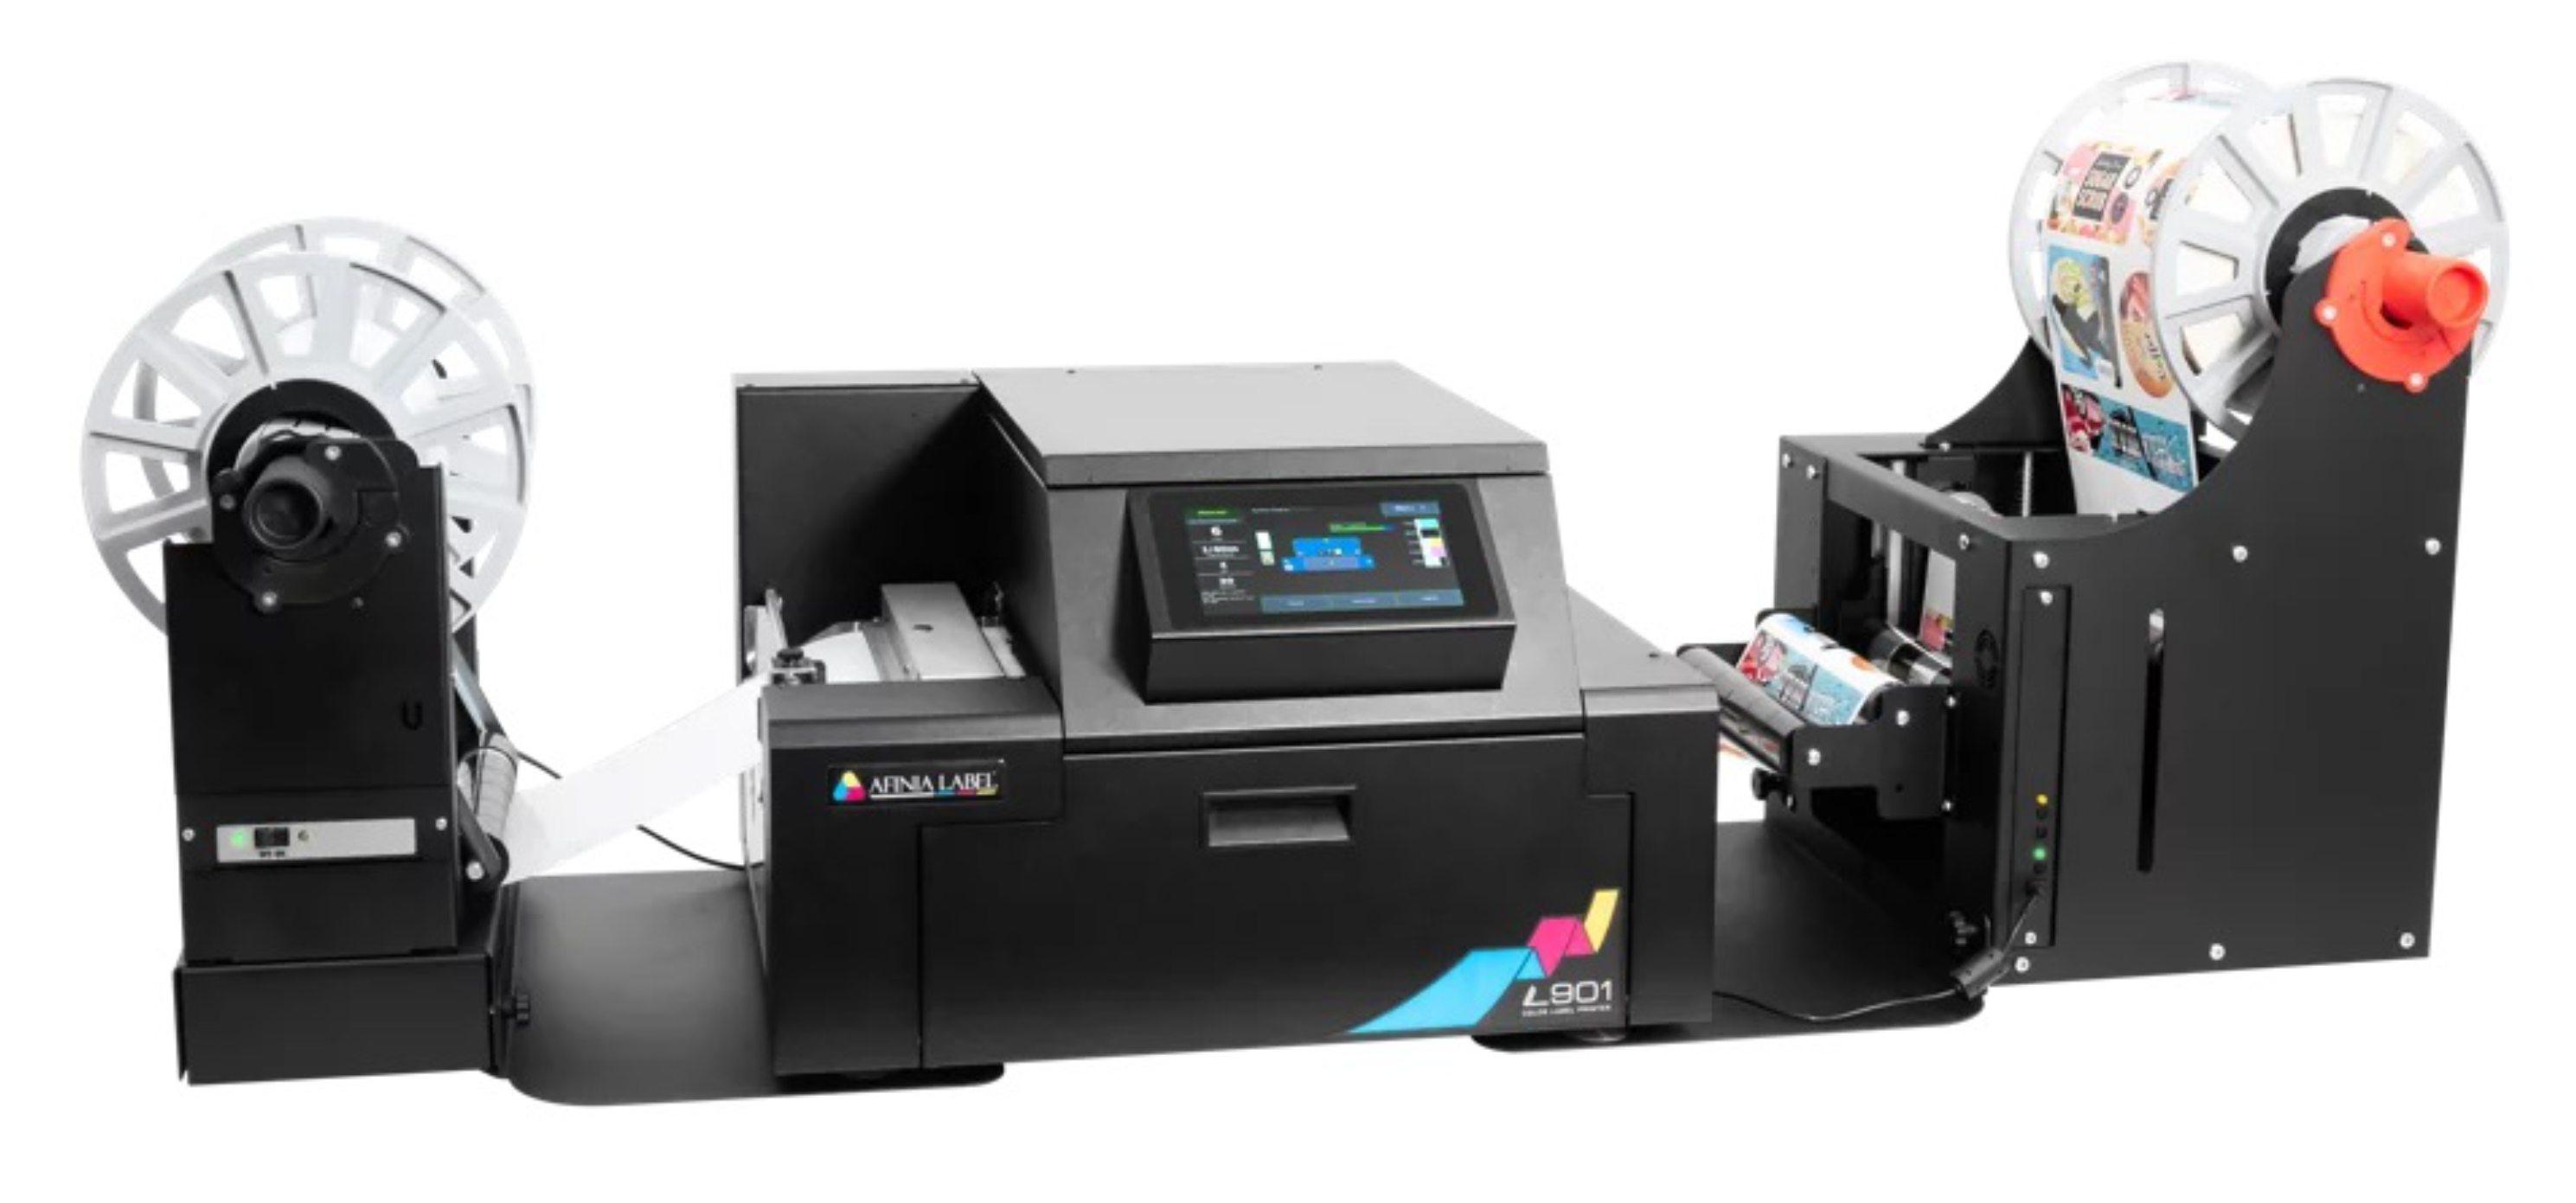 Sistem complet Imprimanta etichete color Afinia L901